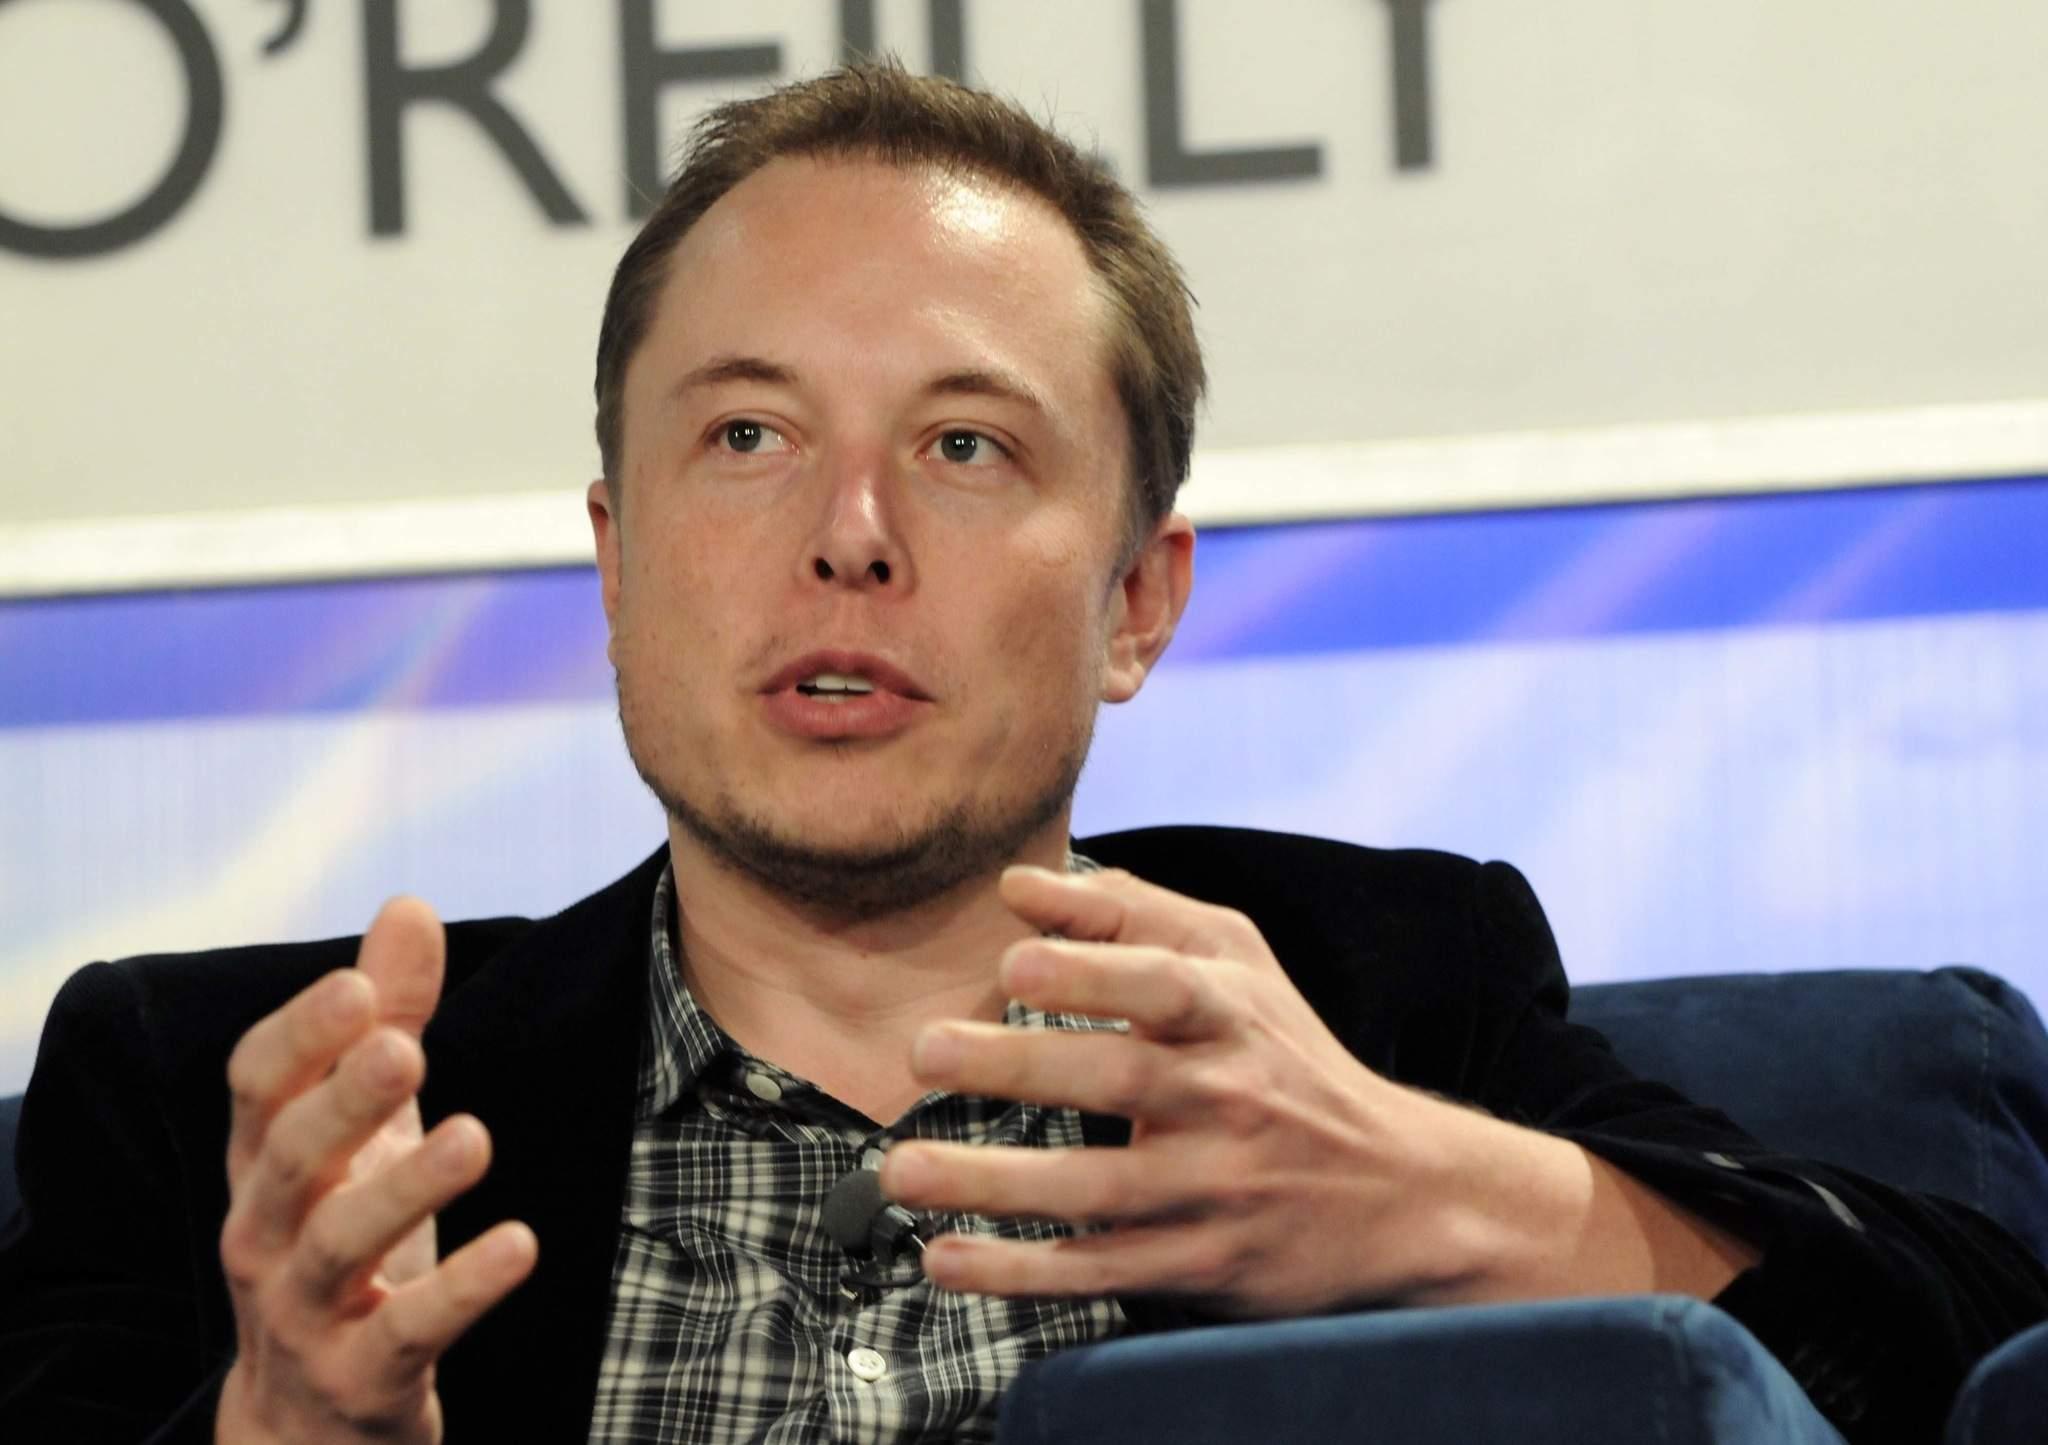 Hackers invadem perfil de Elon Musk no Twitter e divulgam golpe com bitcoin